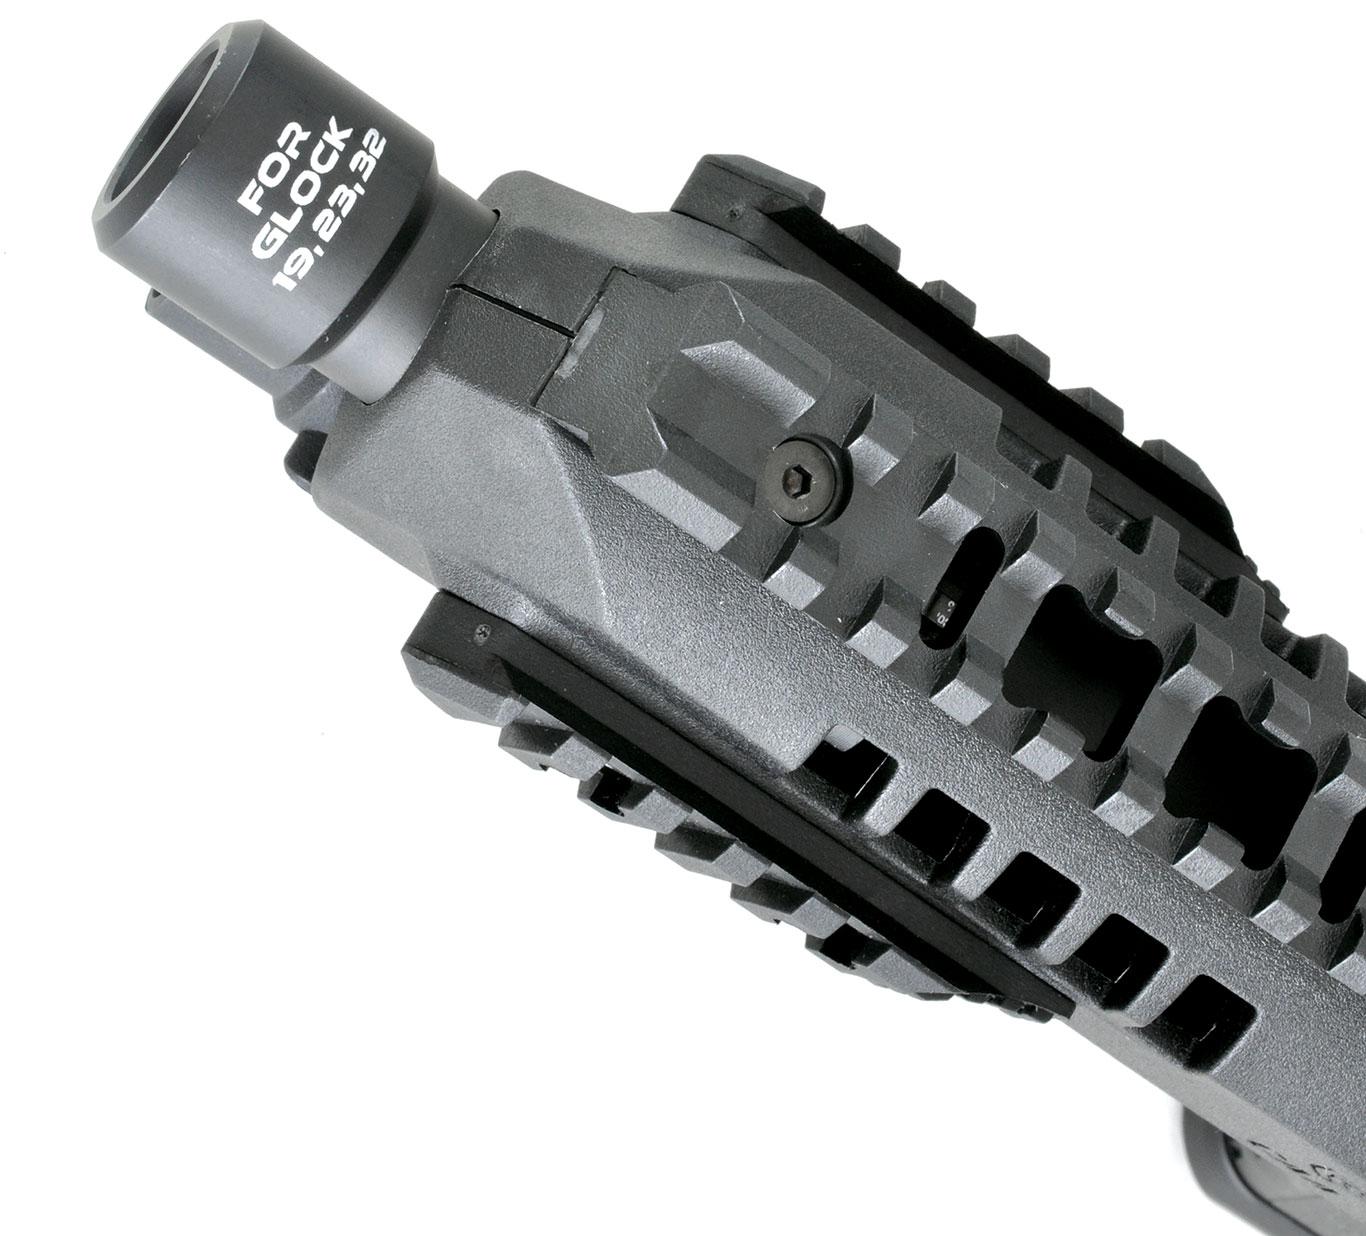 CAA-Micro-Roni-Stabilizer-6